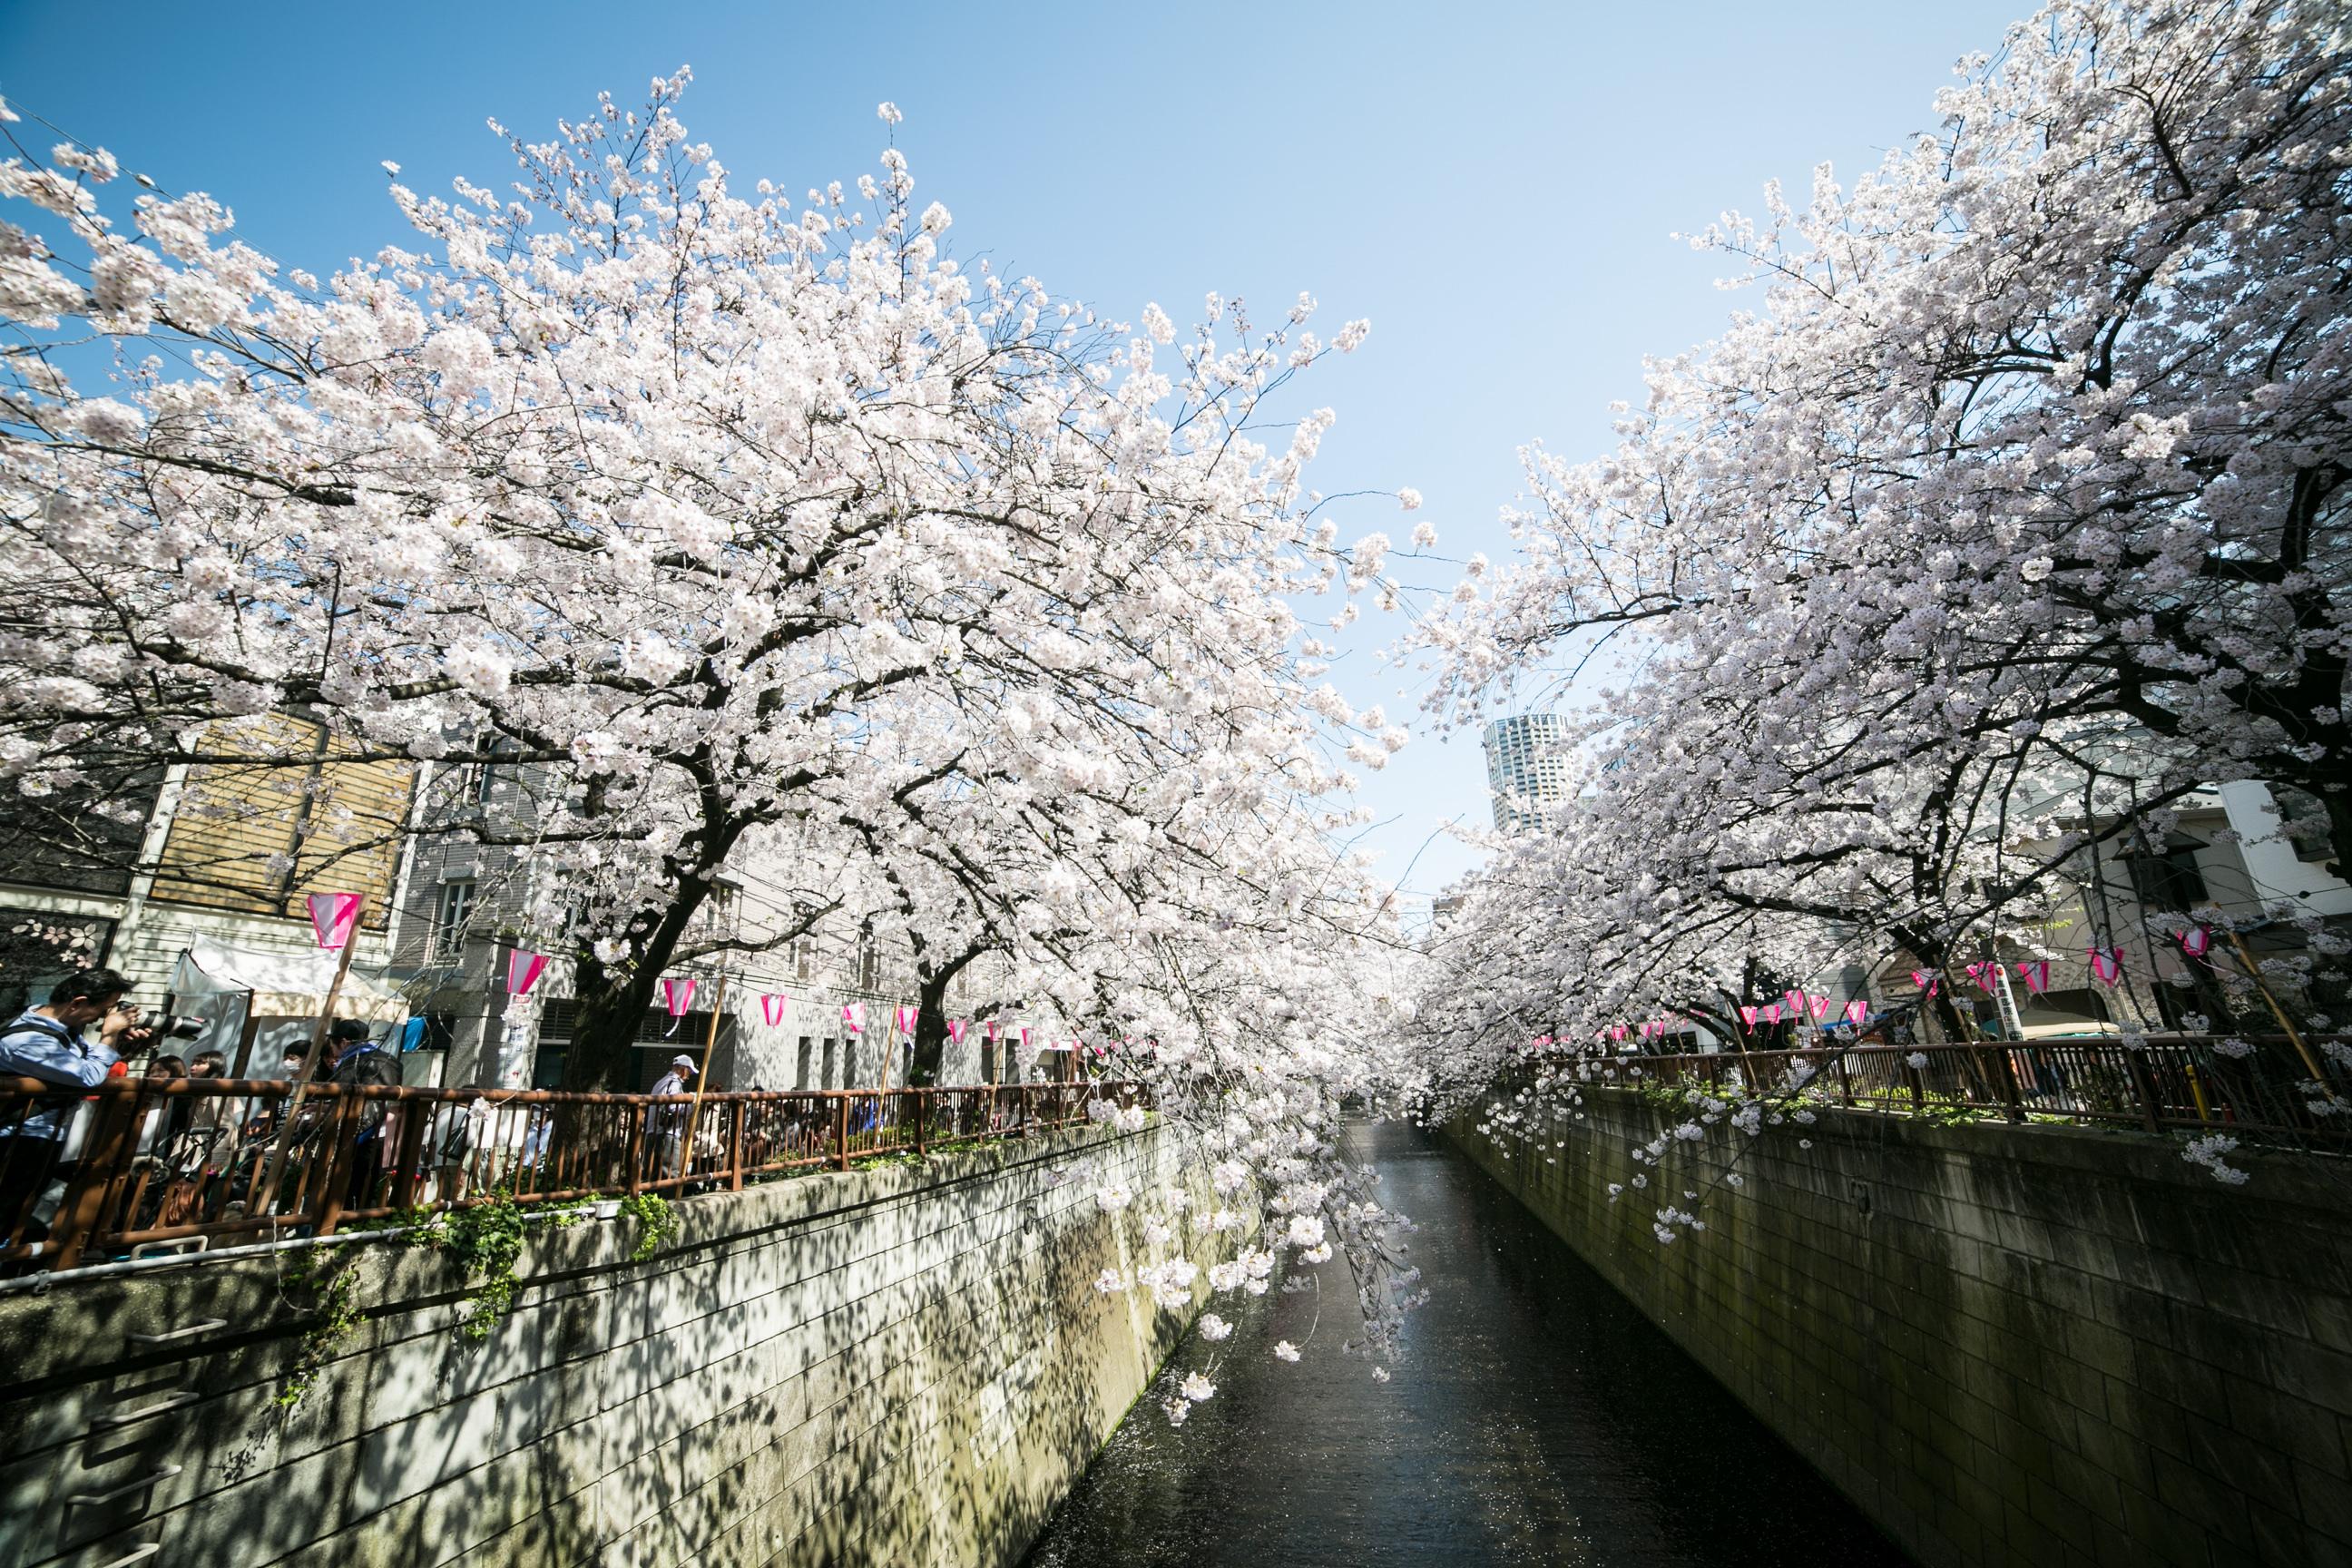 meguro river sakura | Time Out Tokyo